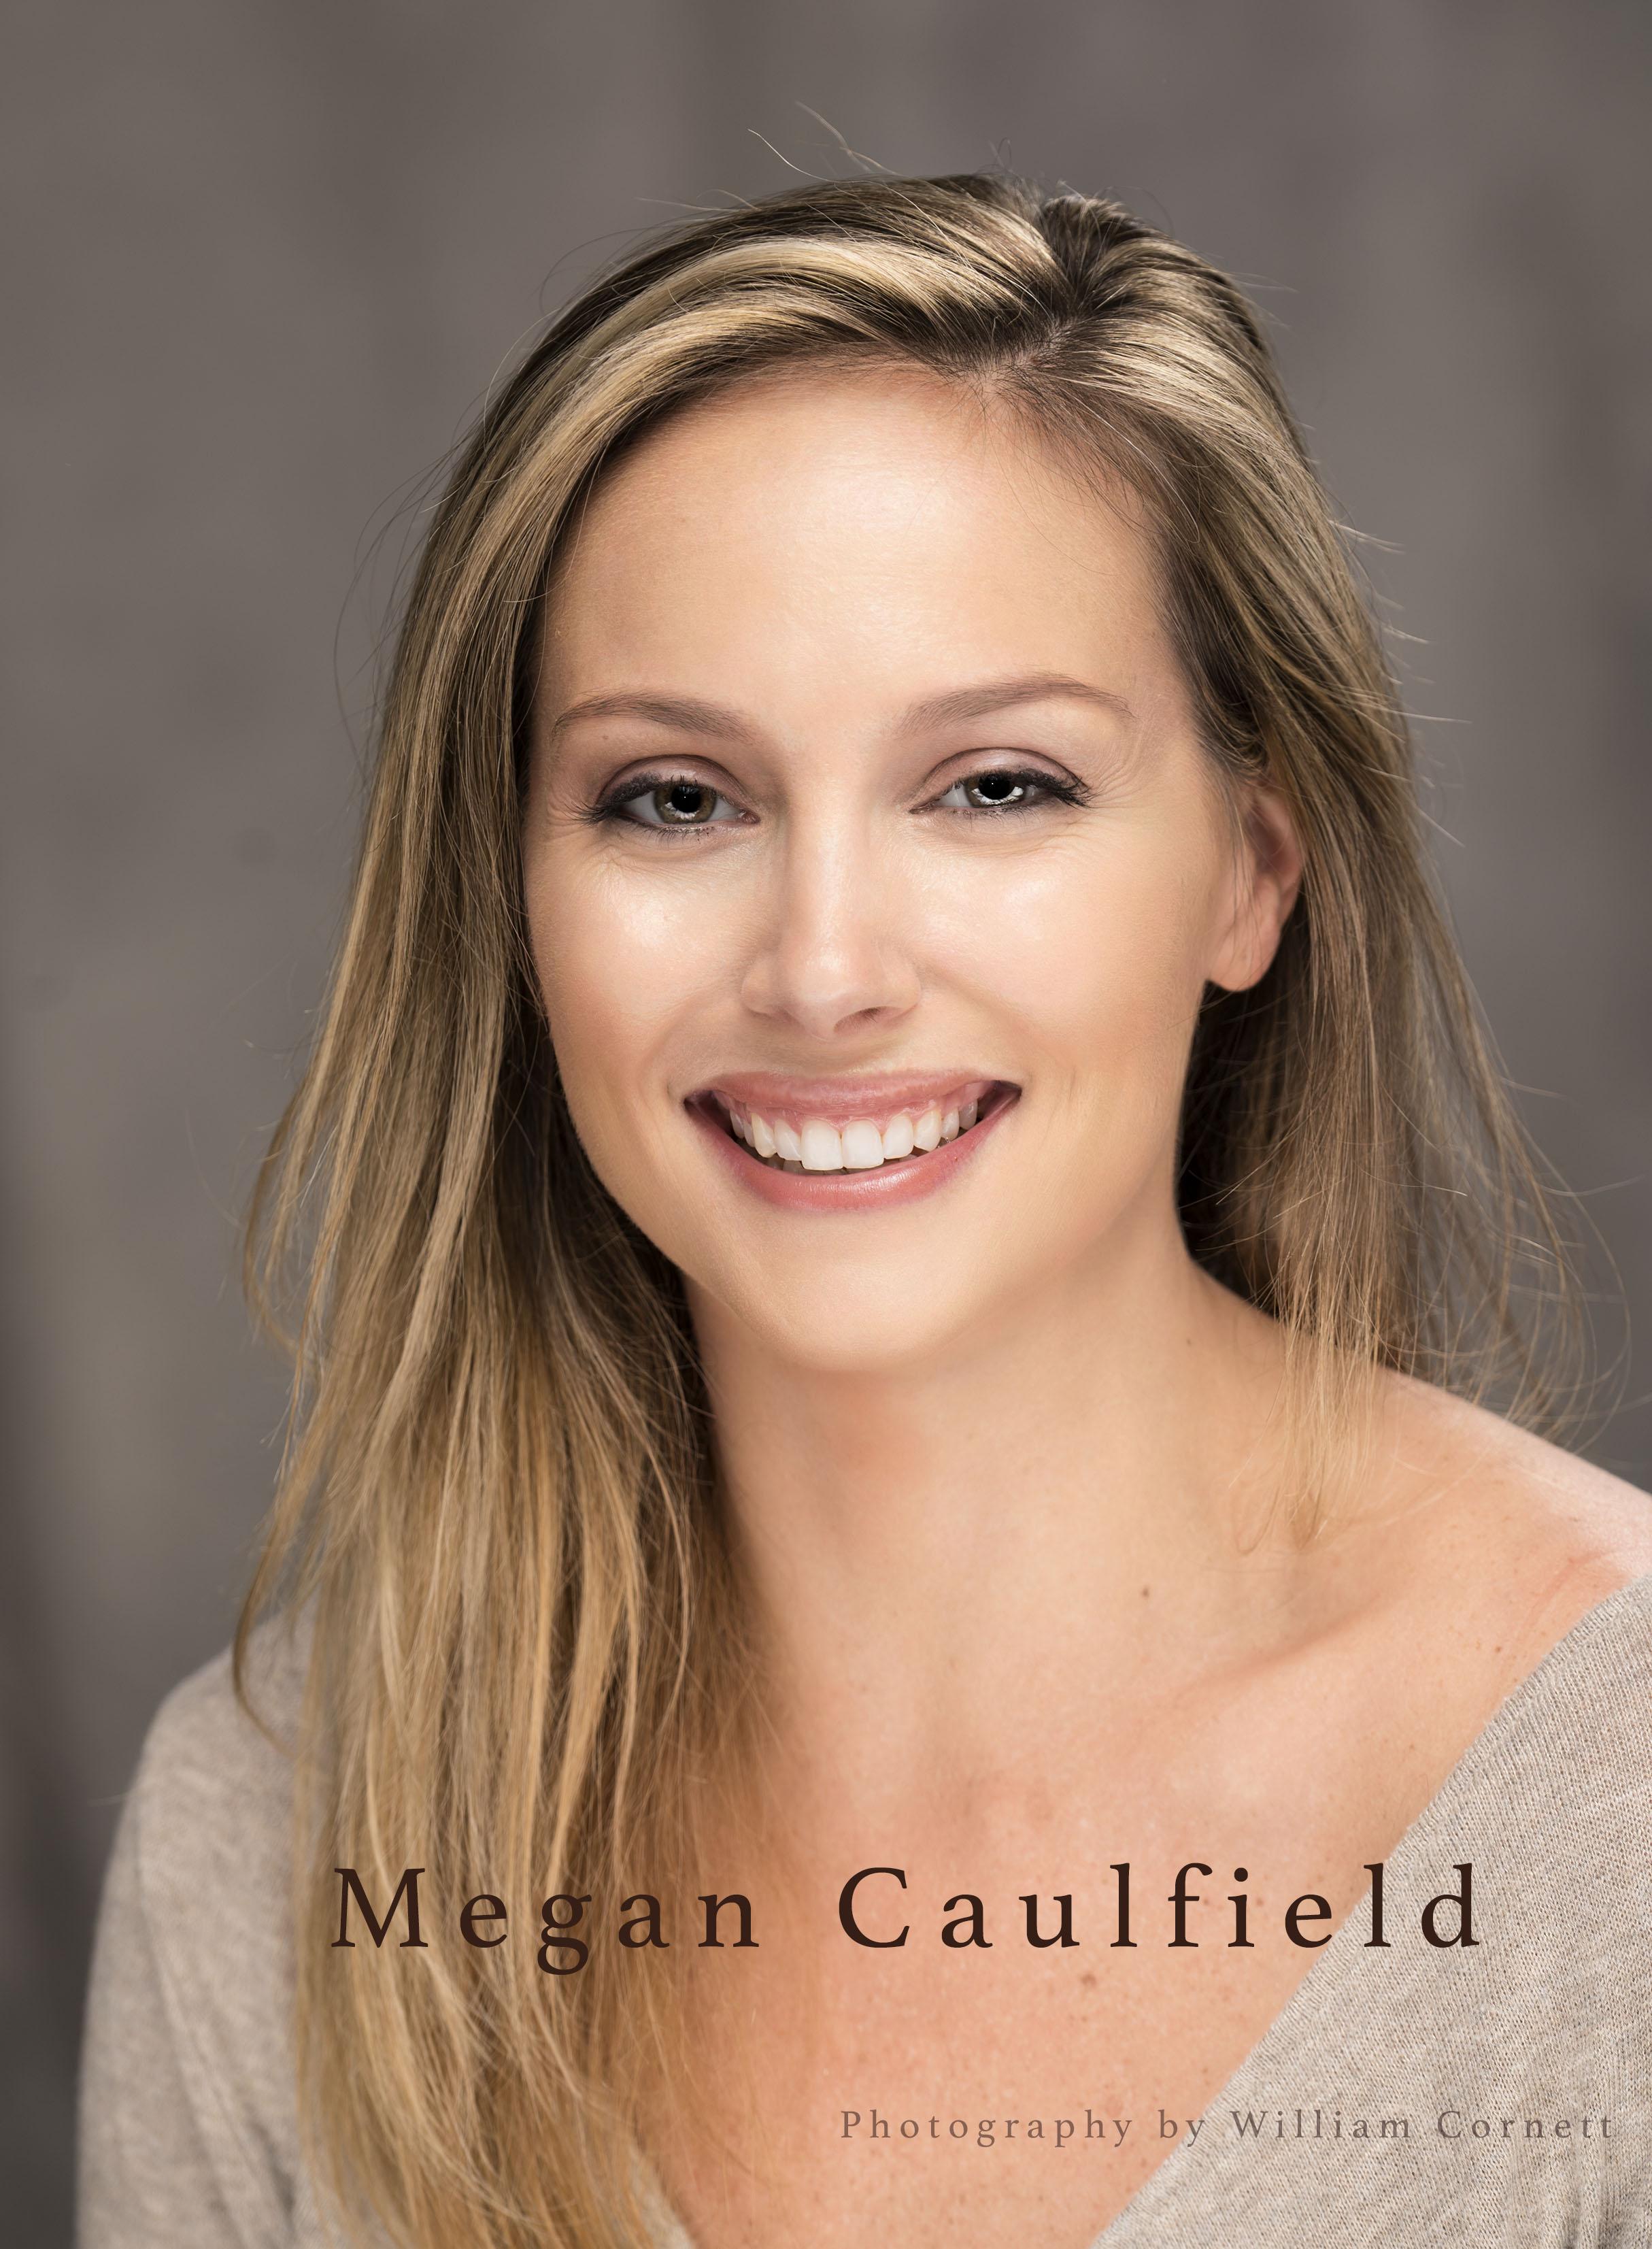 Megan Caulfield